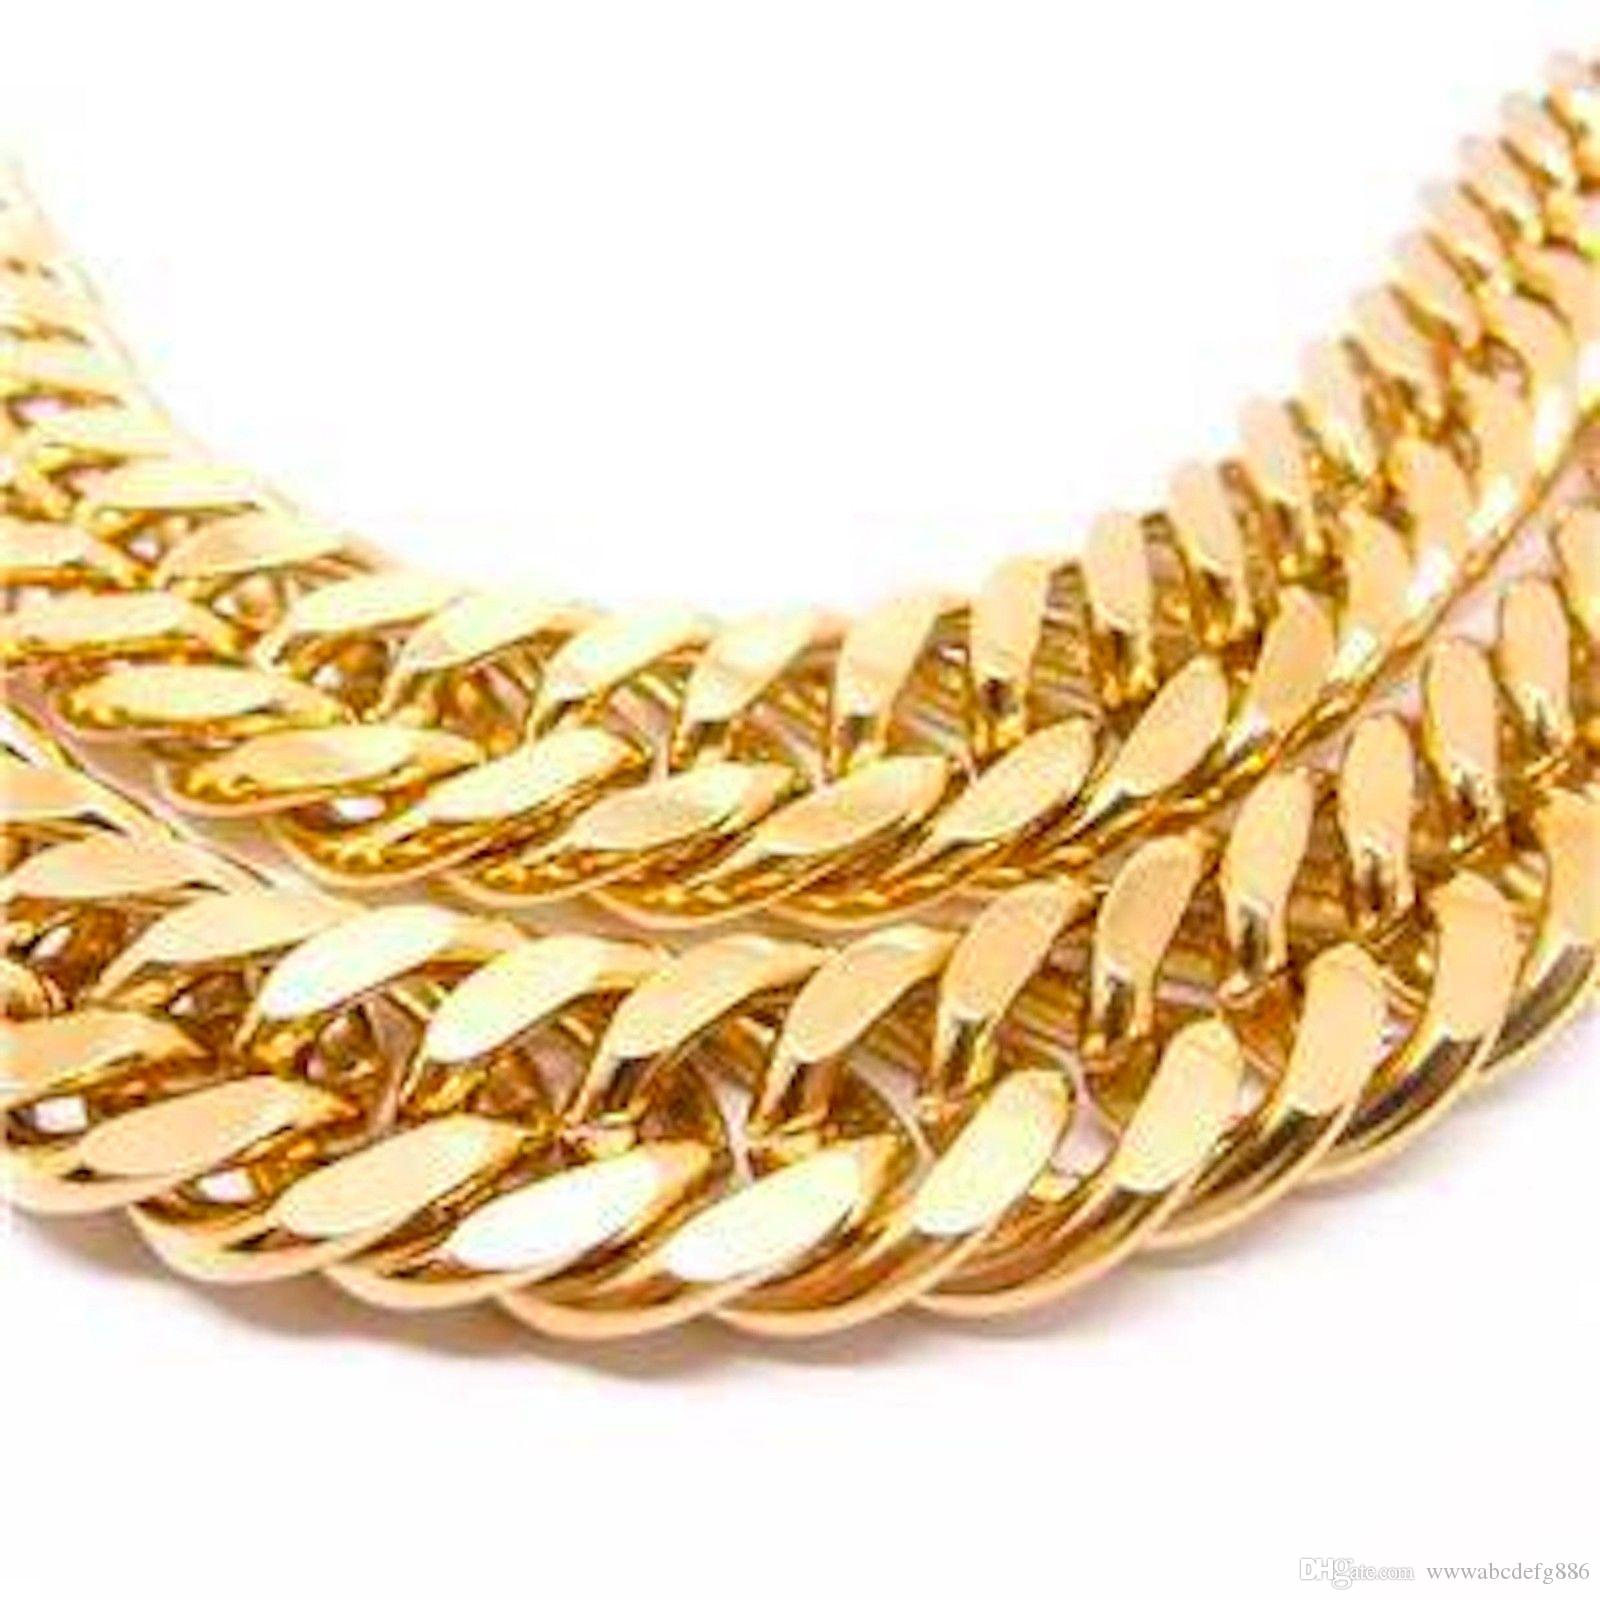 Frete grátis 18 K amarelo real sólido GOLD FILLED N28 CUBO DUPLO CURB CADEIA SÓLIDA MEA GEE COLAR de PRESENTE 23.6 polegada 10mm